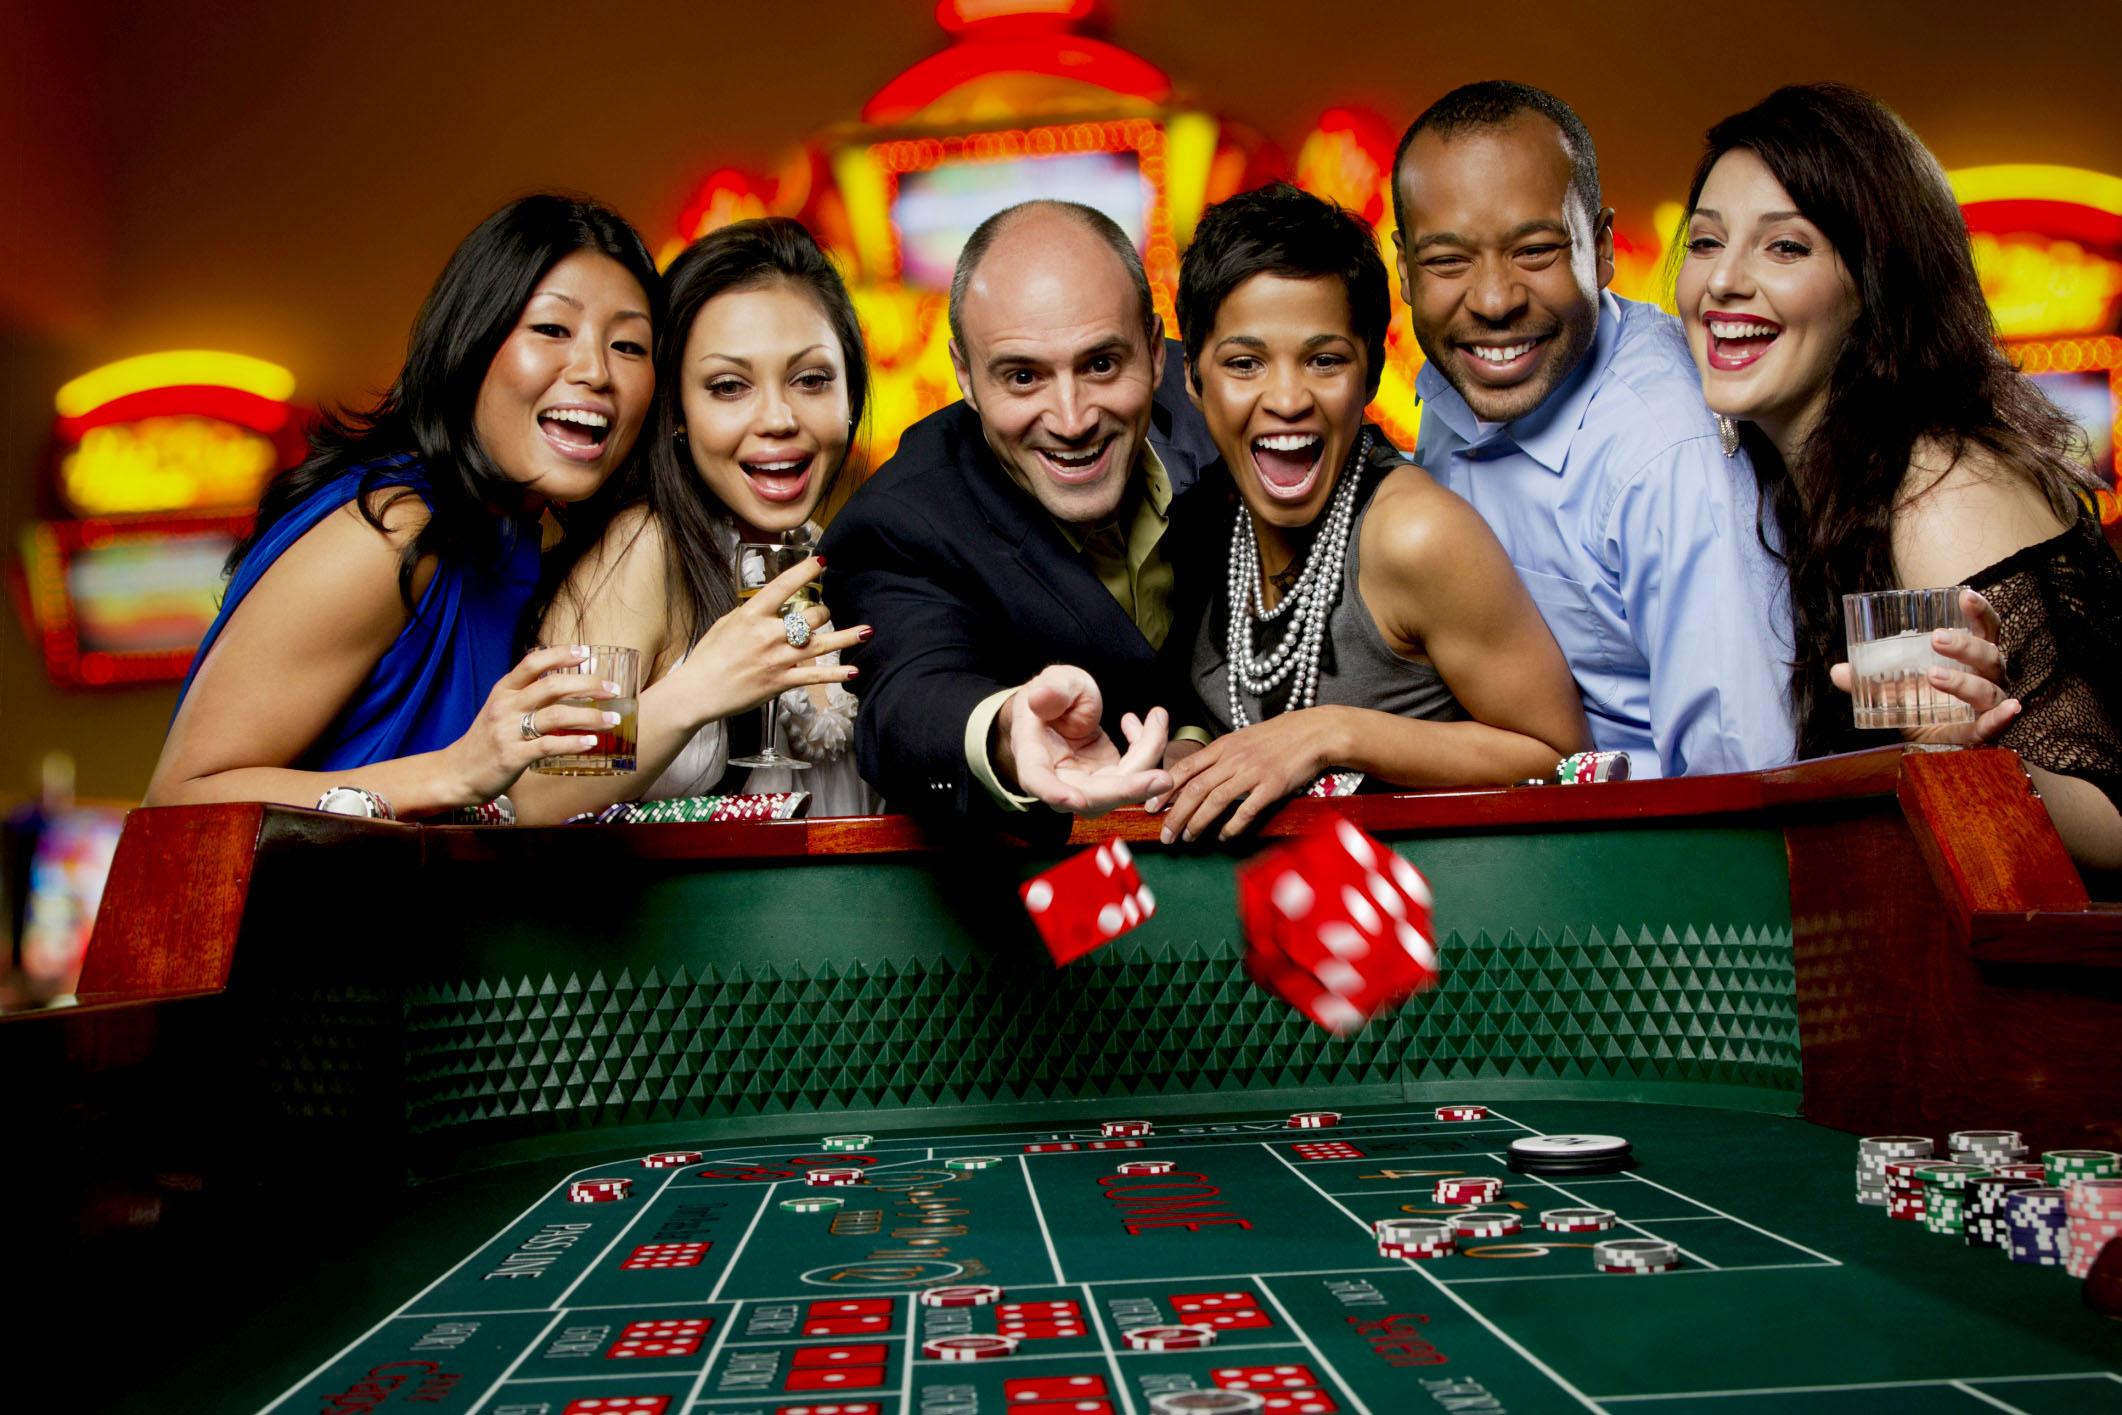 Gambling brettspill 2014